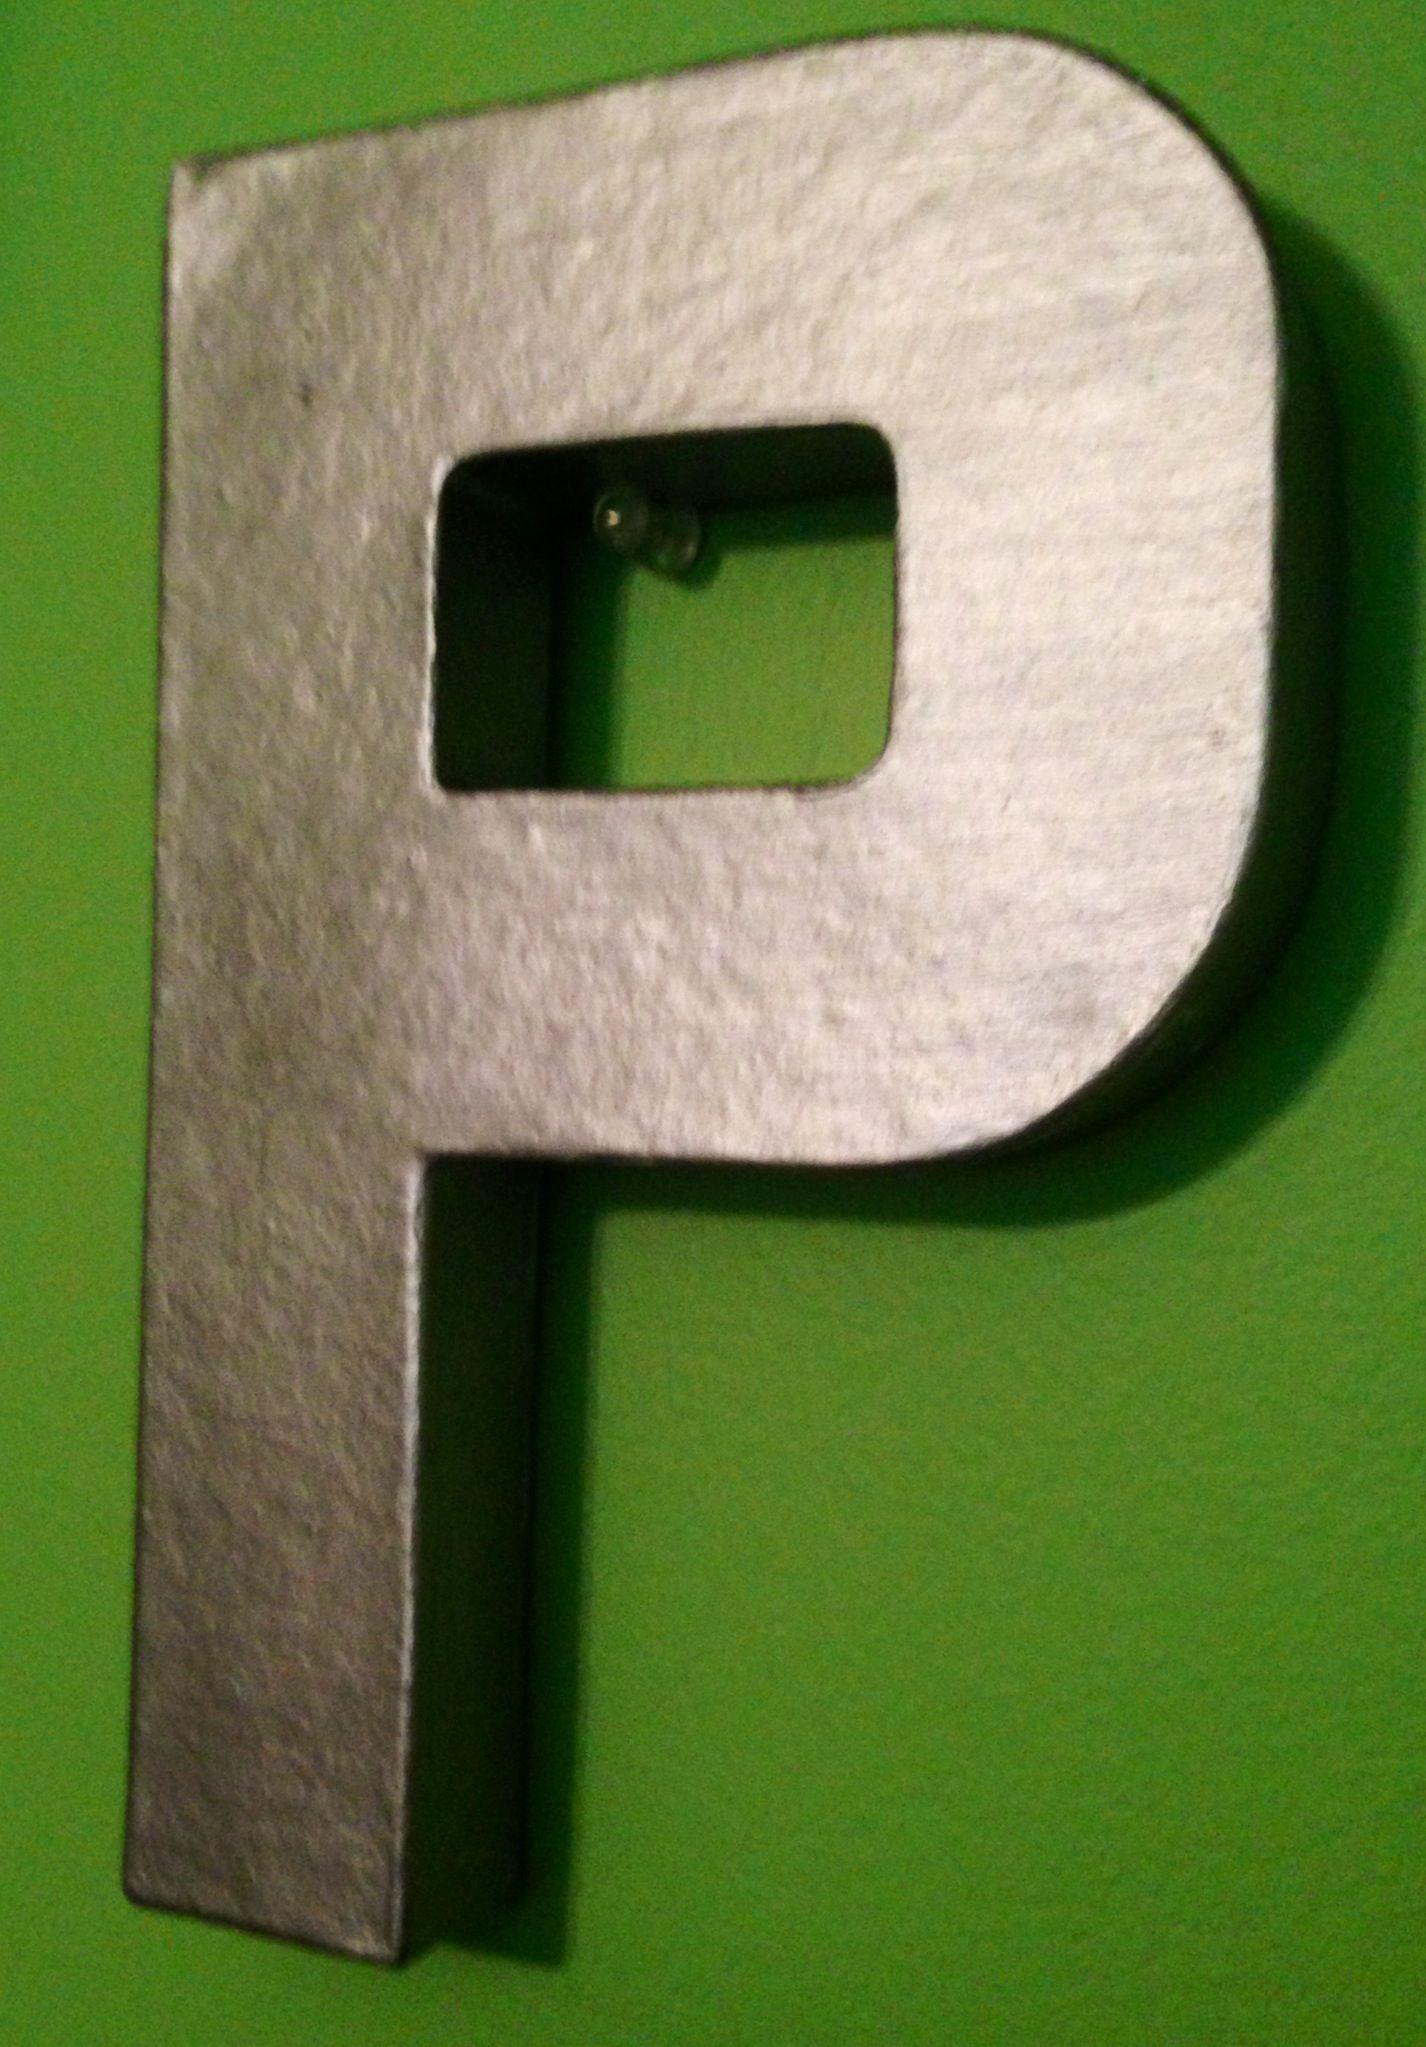 Spray Painted Cardboard Letter From Hobby Lobby To Look Like Anthropologie Metallic Metal Letter Cardboard Letters Metal Letters Spray Paint